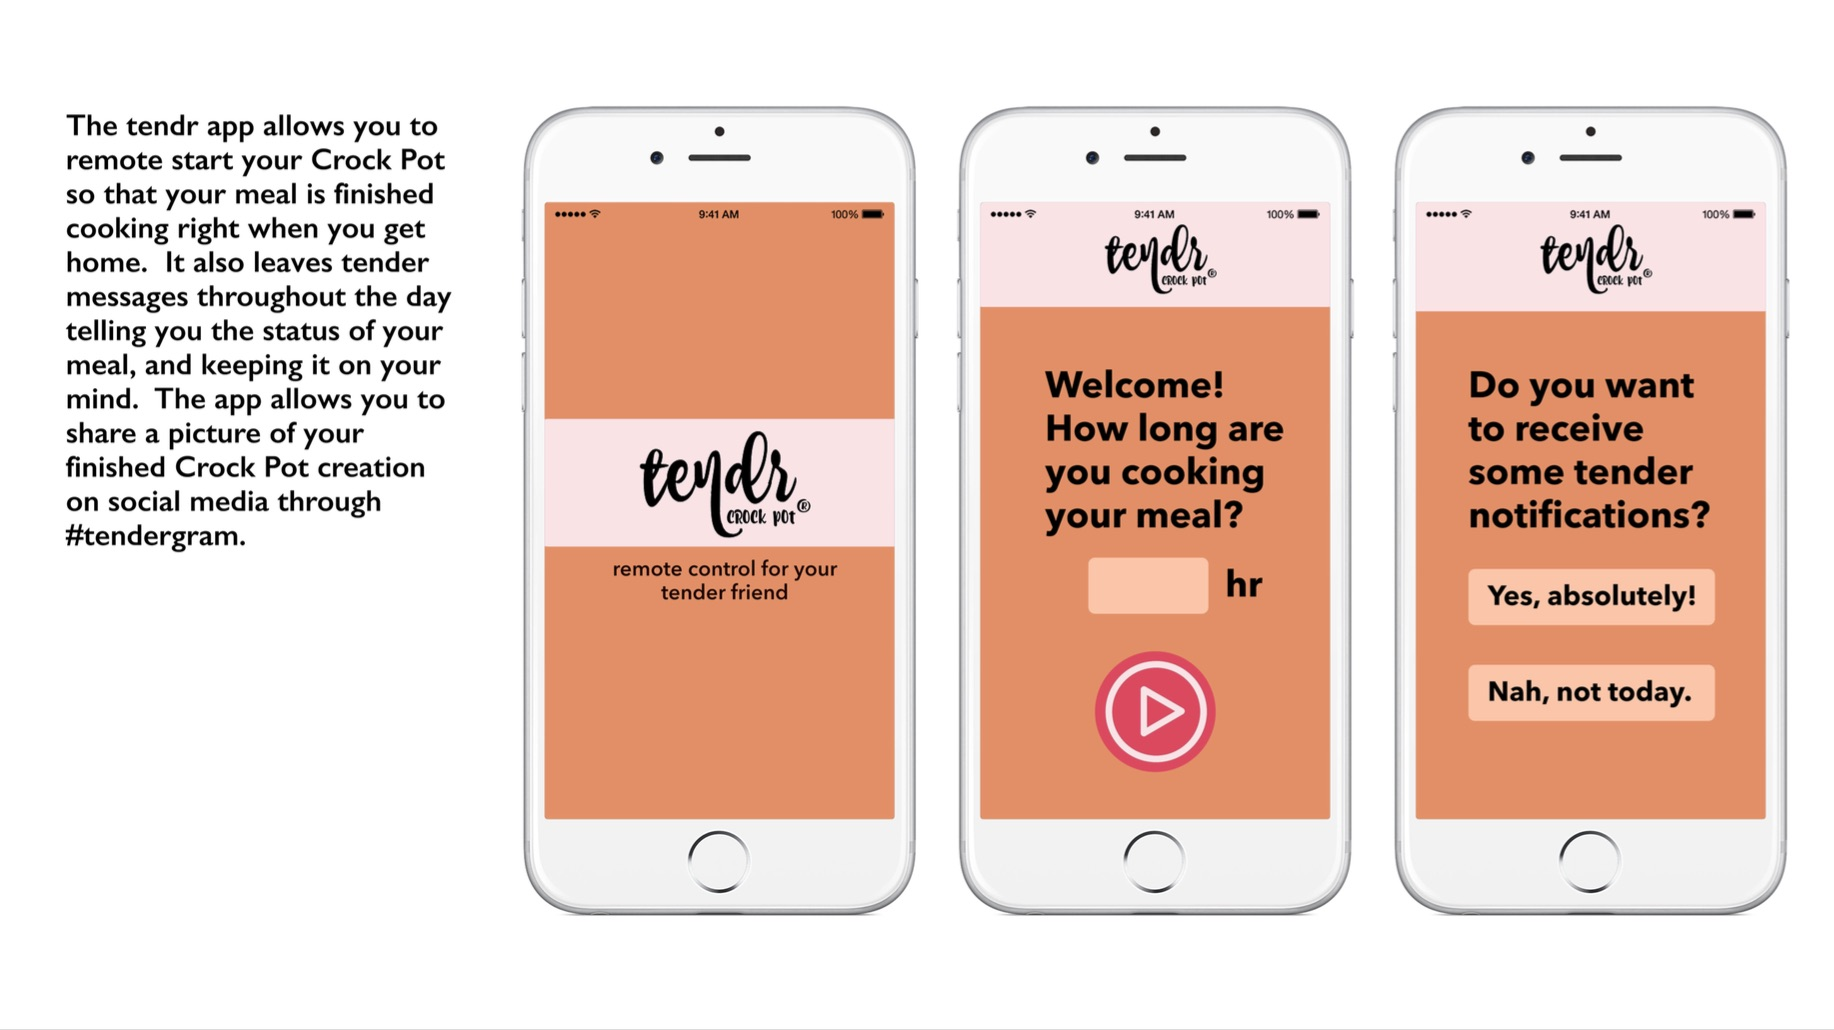 Crockpot App 1.jpg